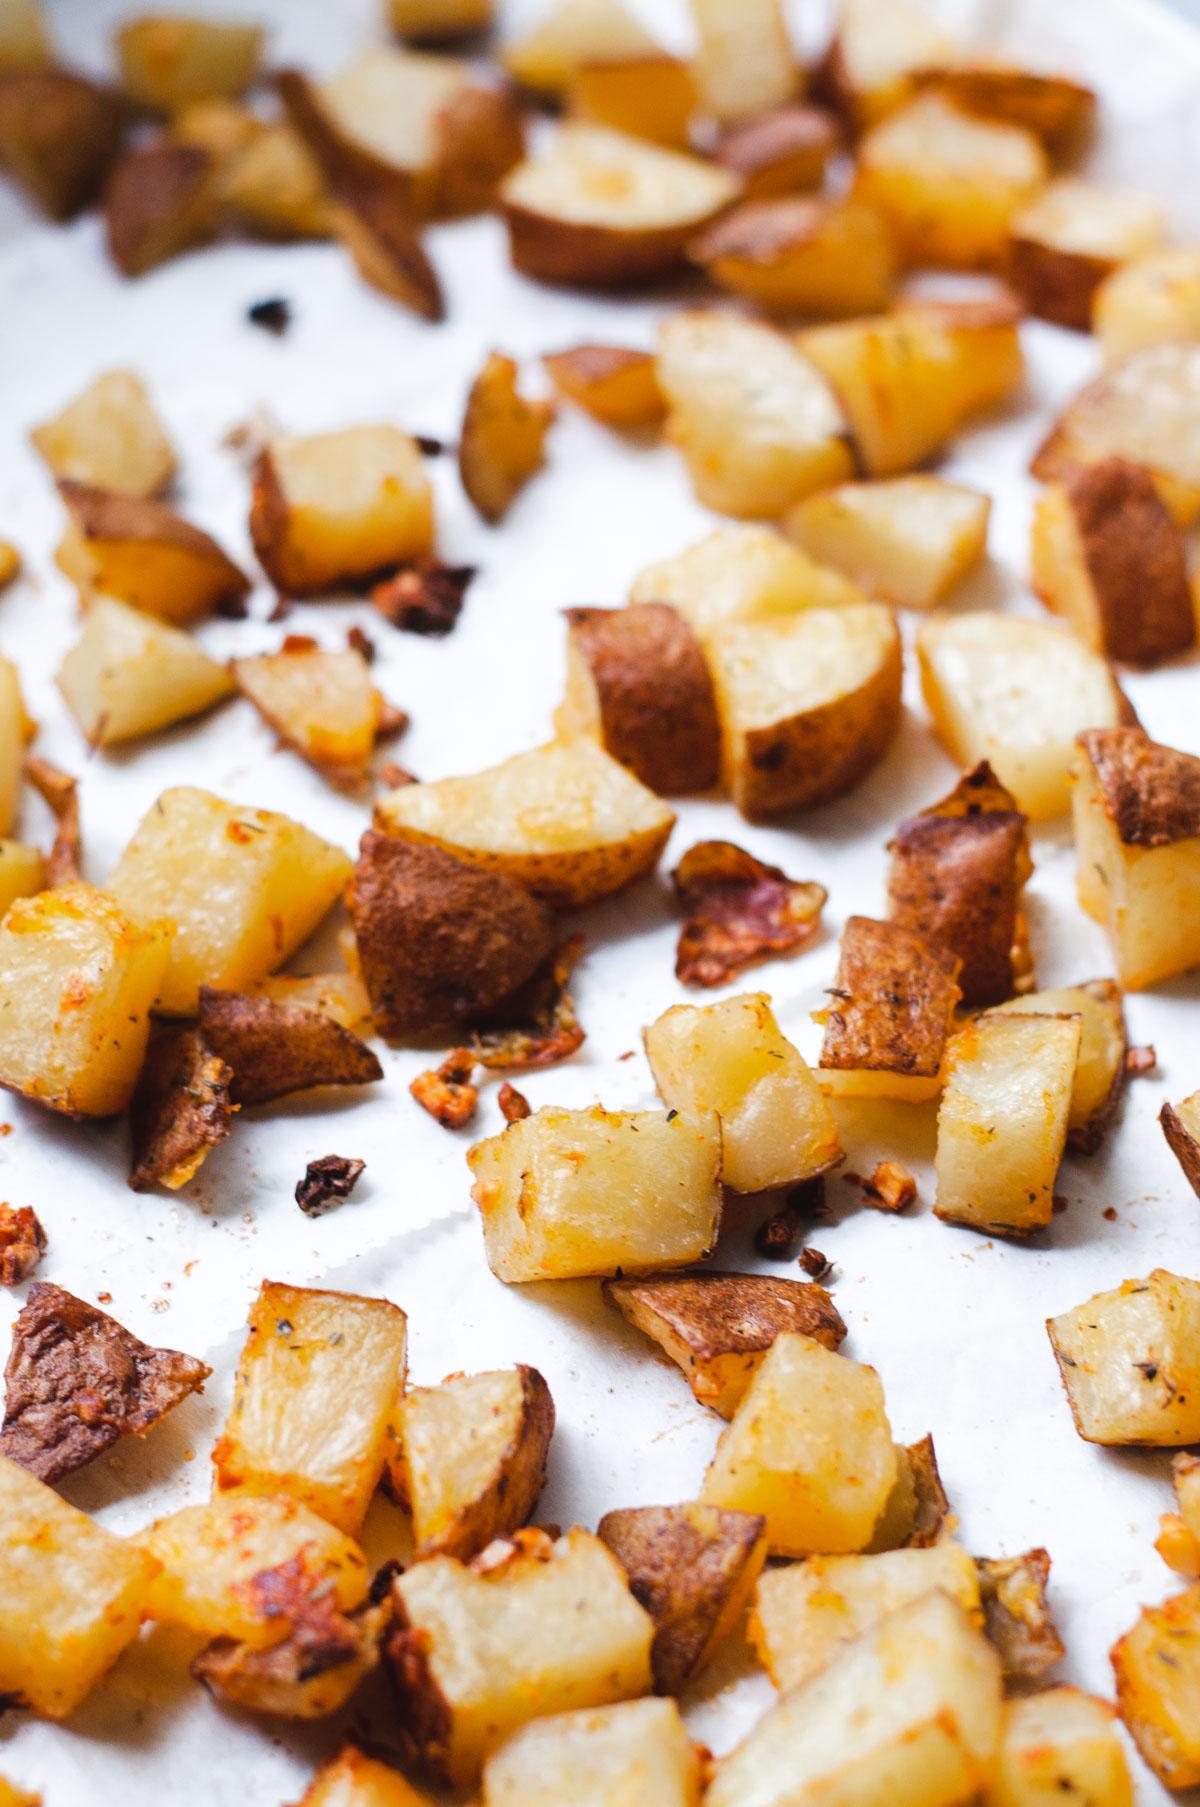 Crispy potatoes on a parchment paper lined sheet pan